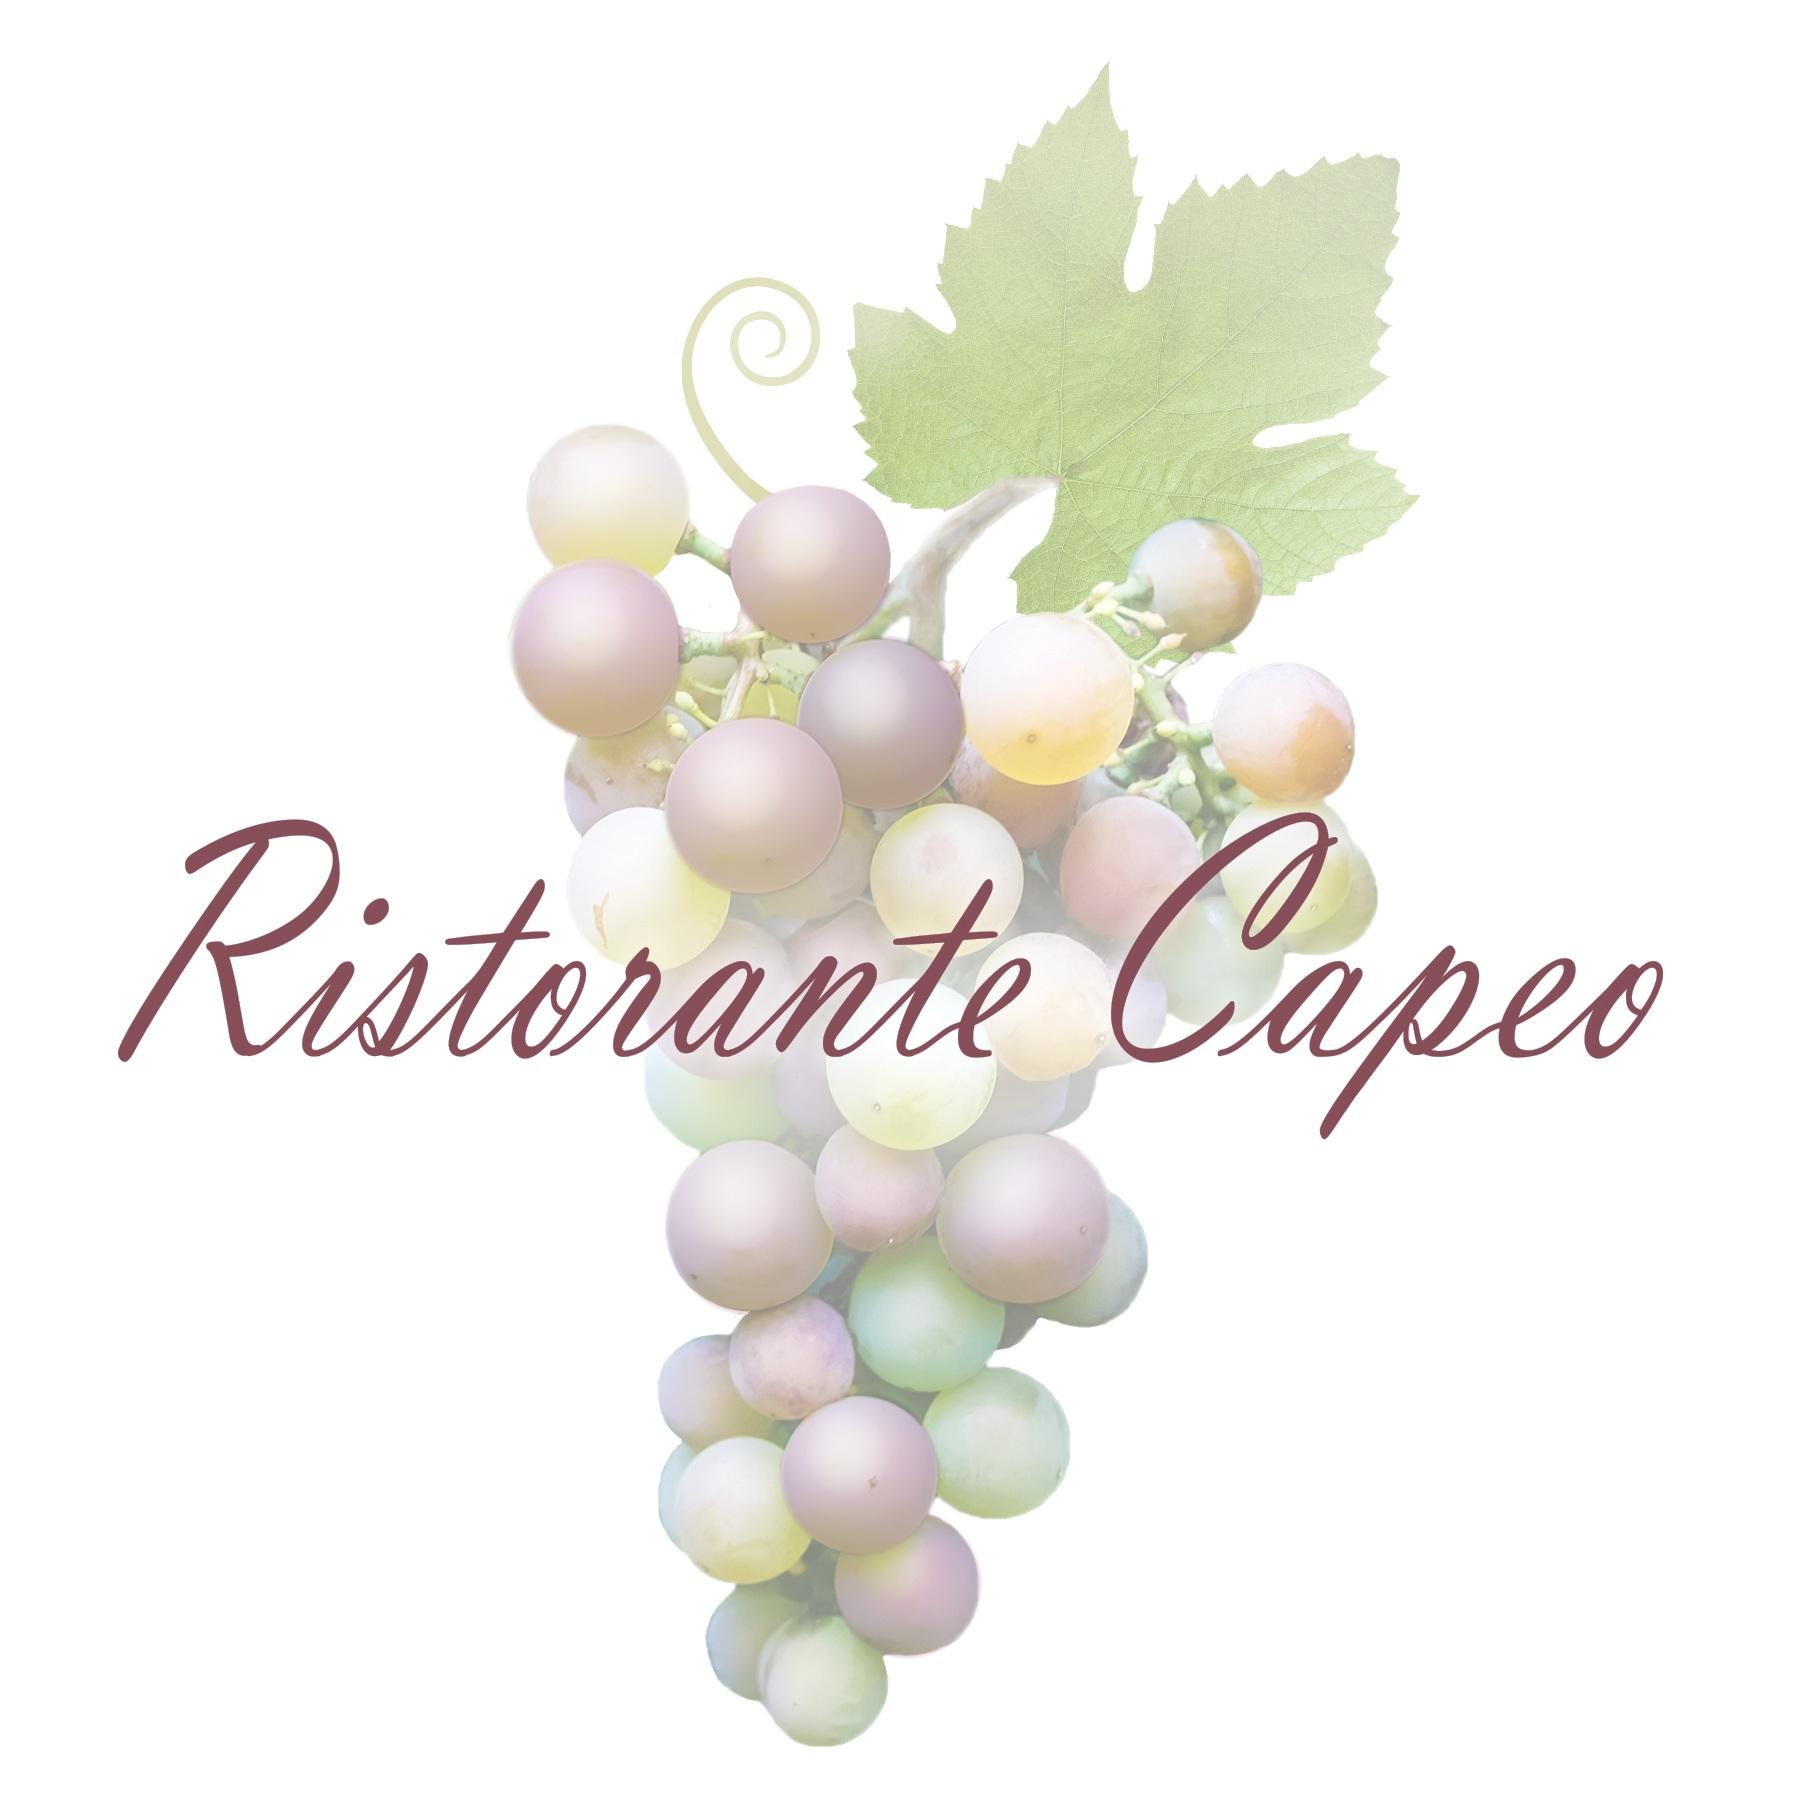 Capeo_Fine_Italian_dining_North_Little_Rock_Arkansas.jpg